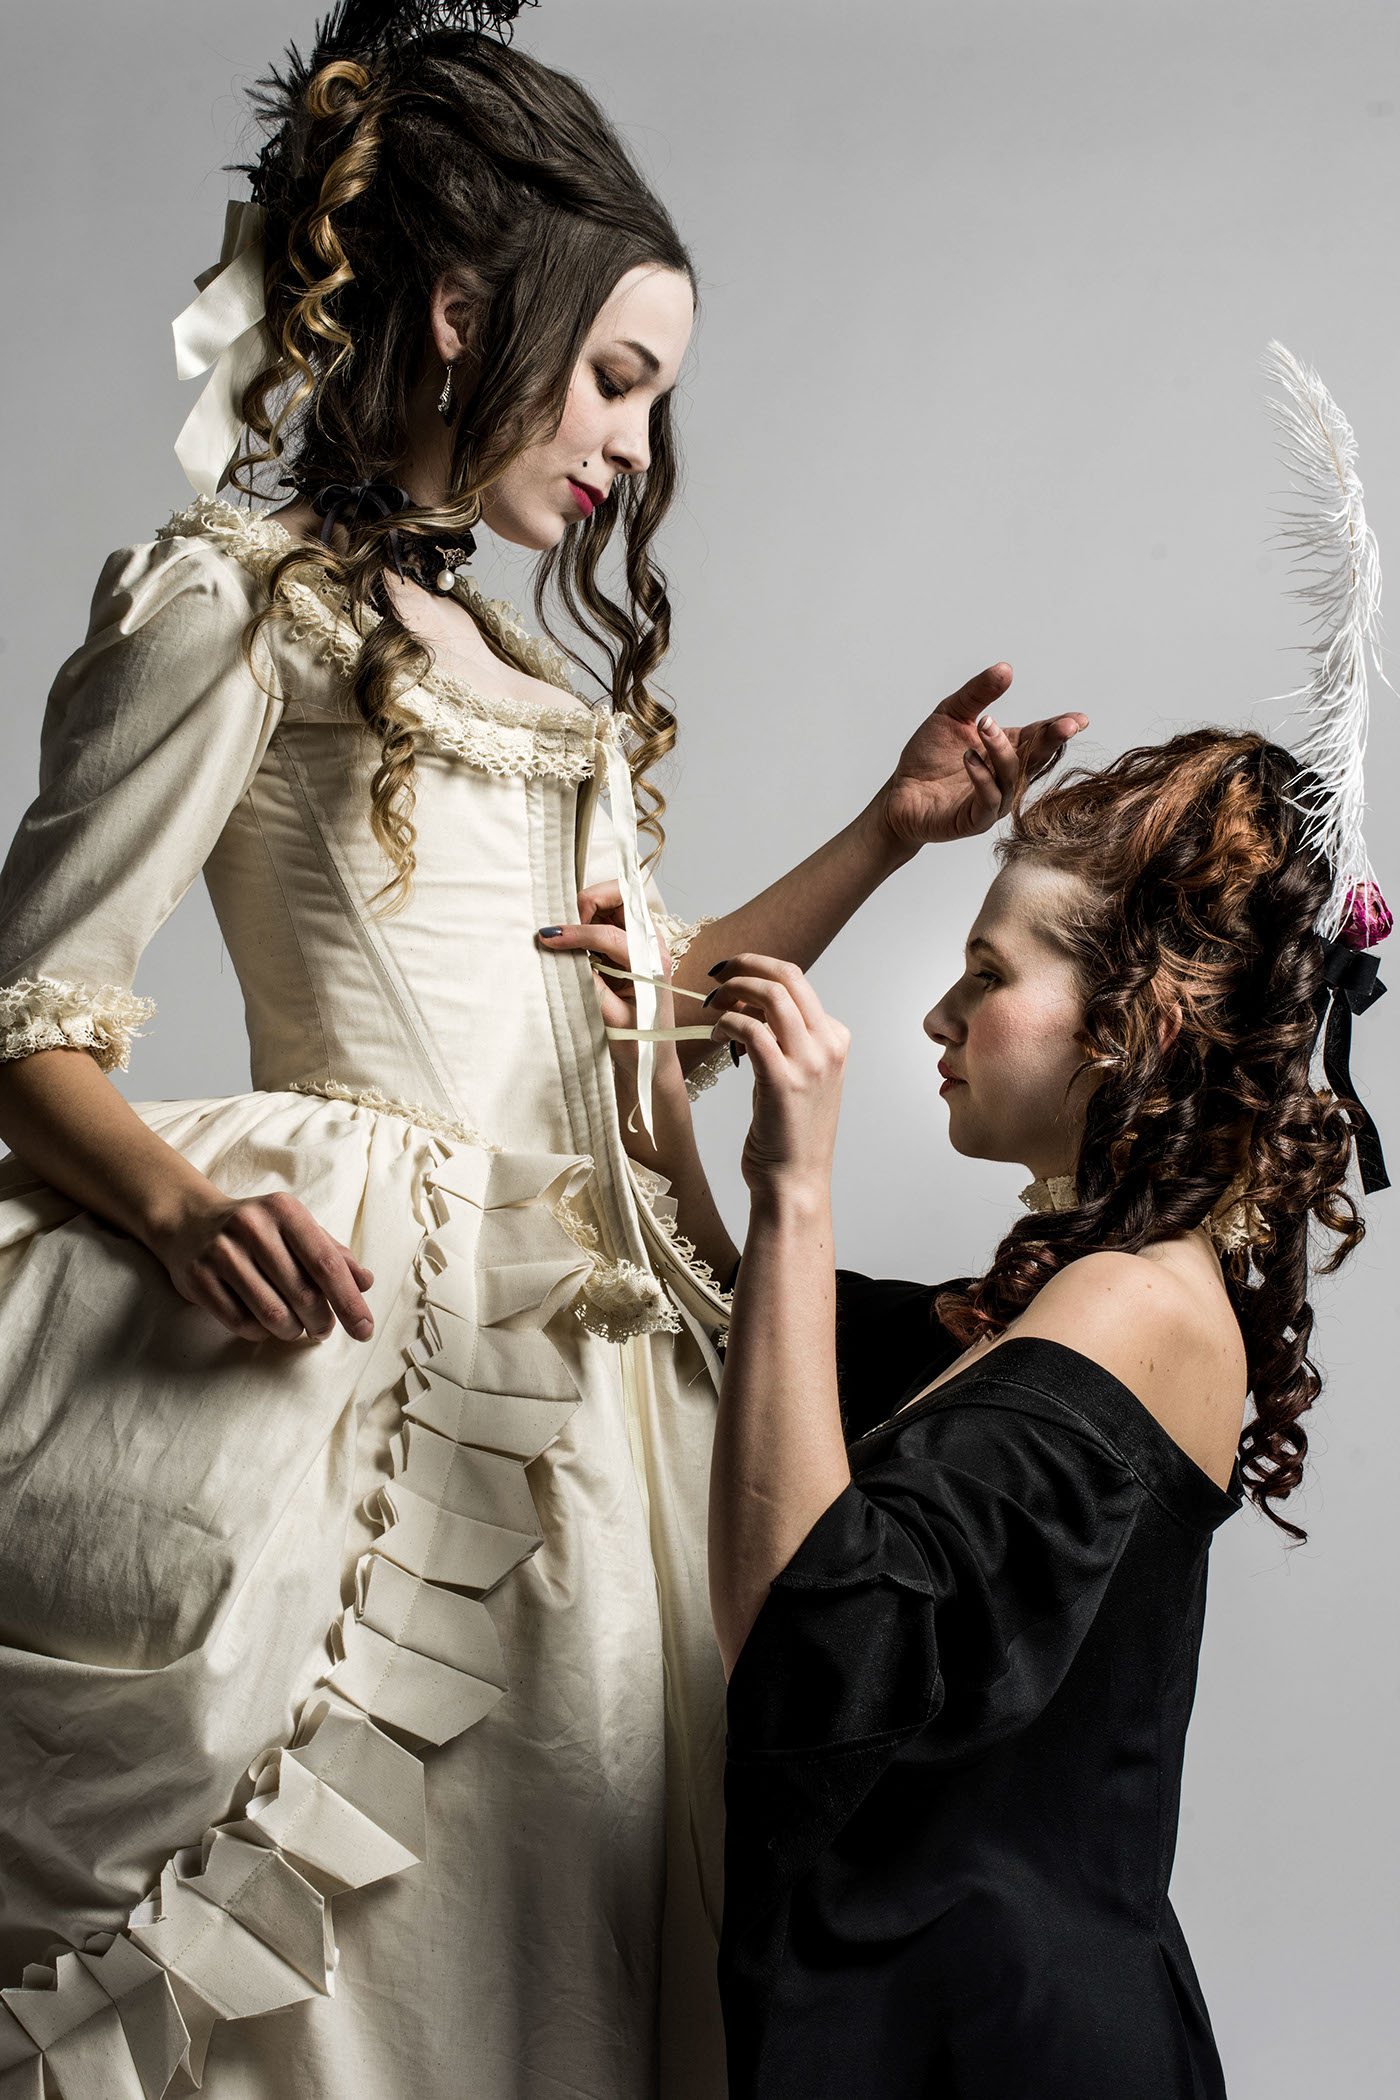 18th Century Dress Replica on Behance